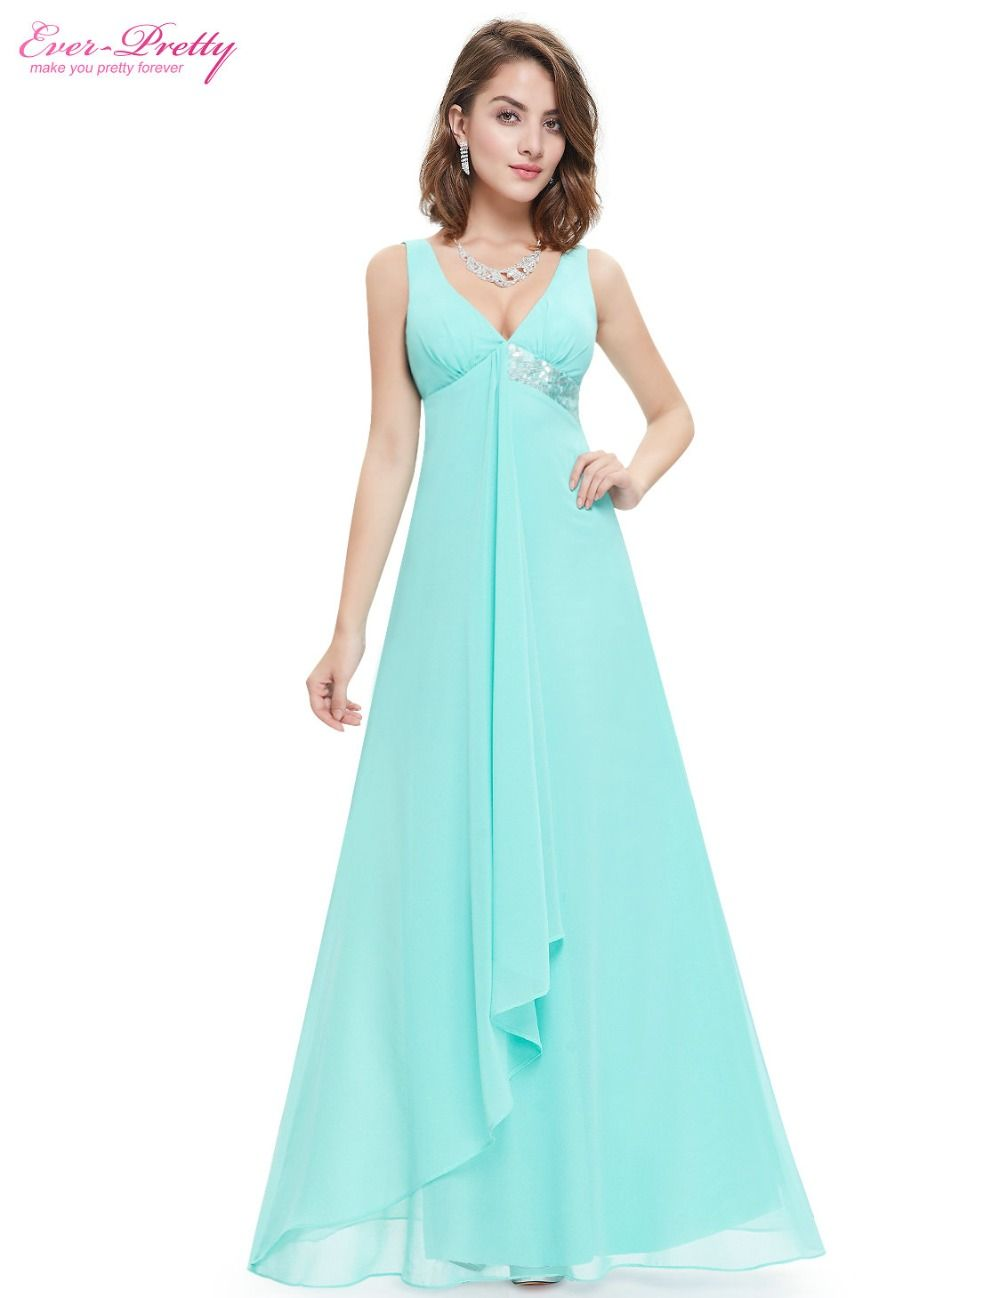 Charmant Royal Lila Prom Kleider Bilder - Brautkleider Ideen ...